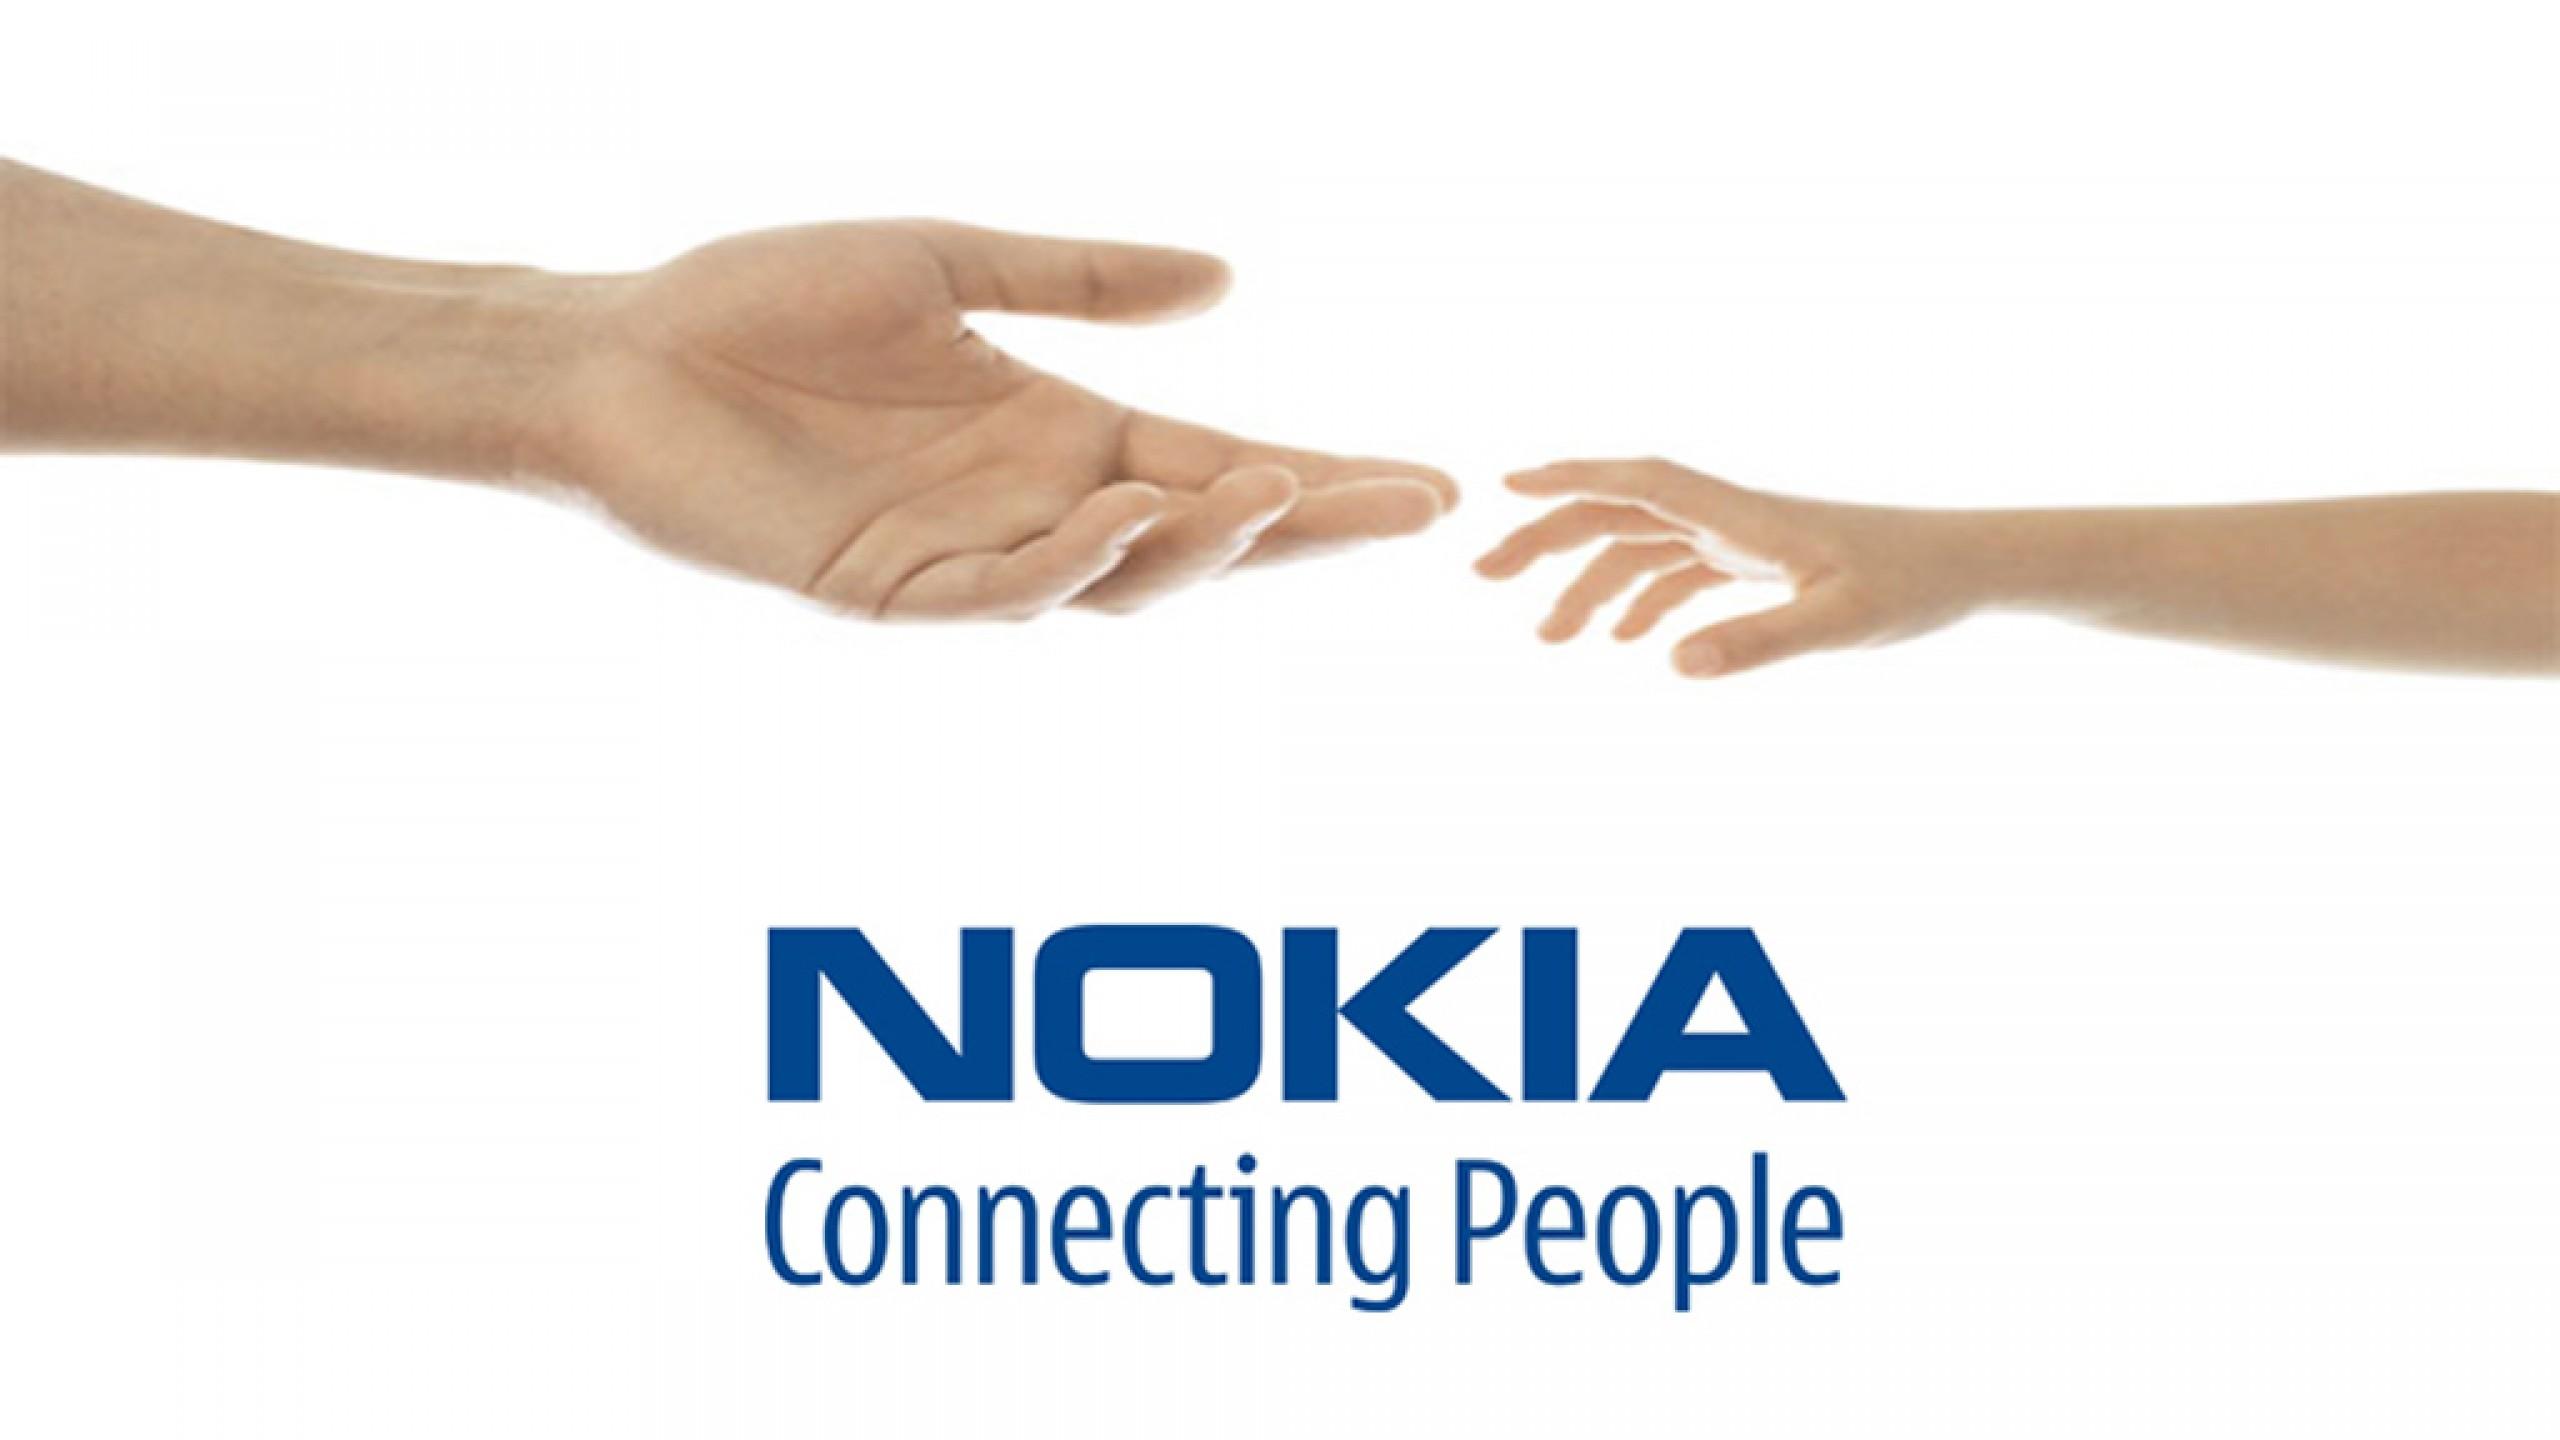 Nokia Logo Wallpapers 2560x1440